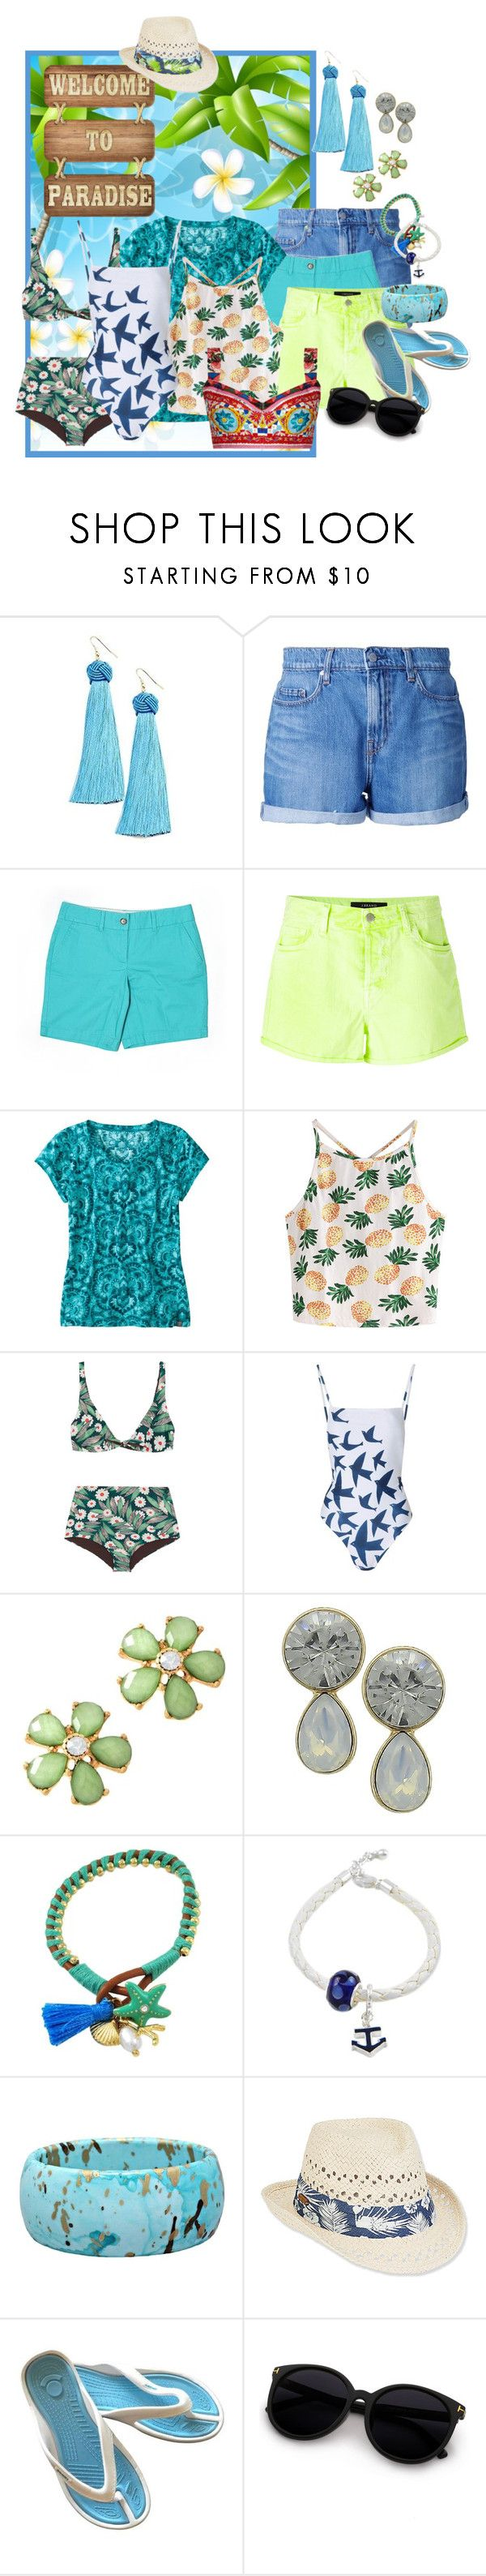 """Paradise"" by shoppe23 on Polyvore featuring Vanessa Mooney, Nobody Denim, LOFT, J Brand, Title Nine, WithChic, Dolce&Gabbana, Mara Hoffman, Caribbean Joe and Summer"